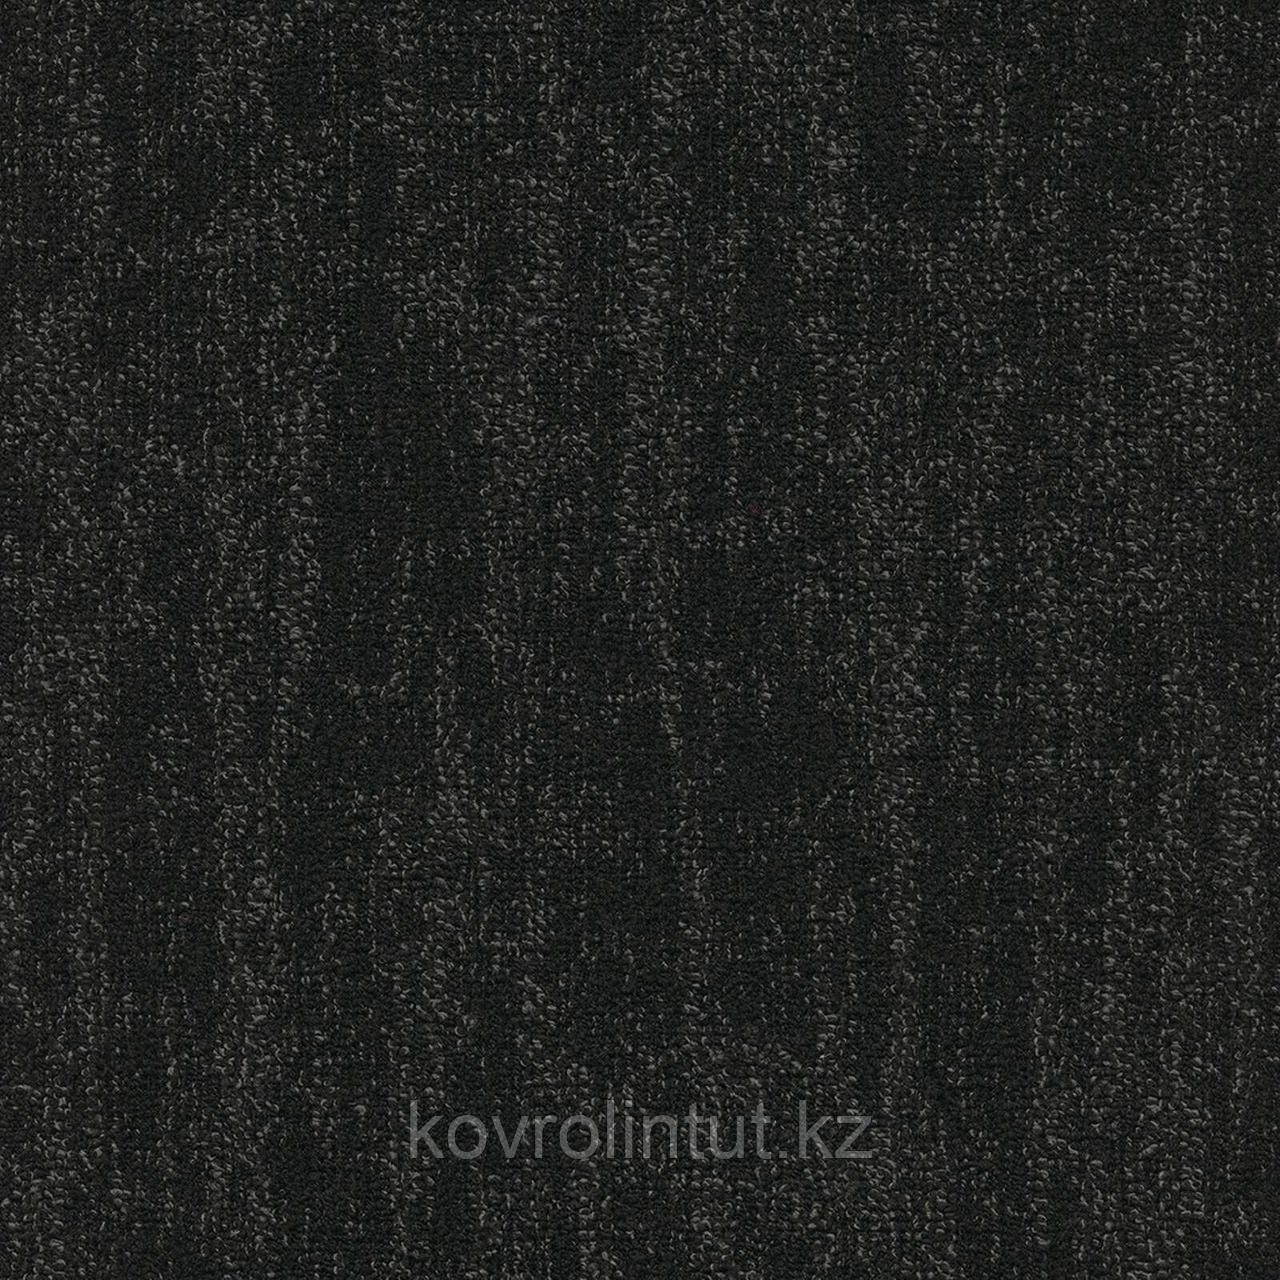 Плитка ковровая Modulyss Willow 966, 100% PA